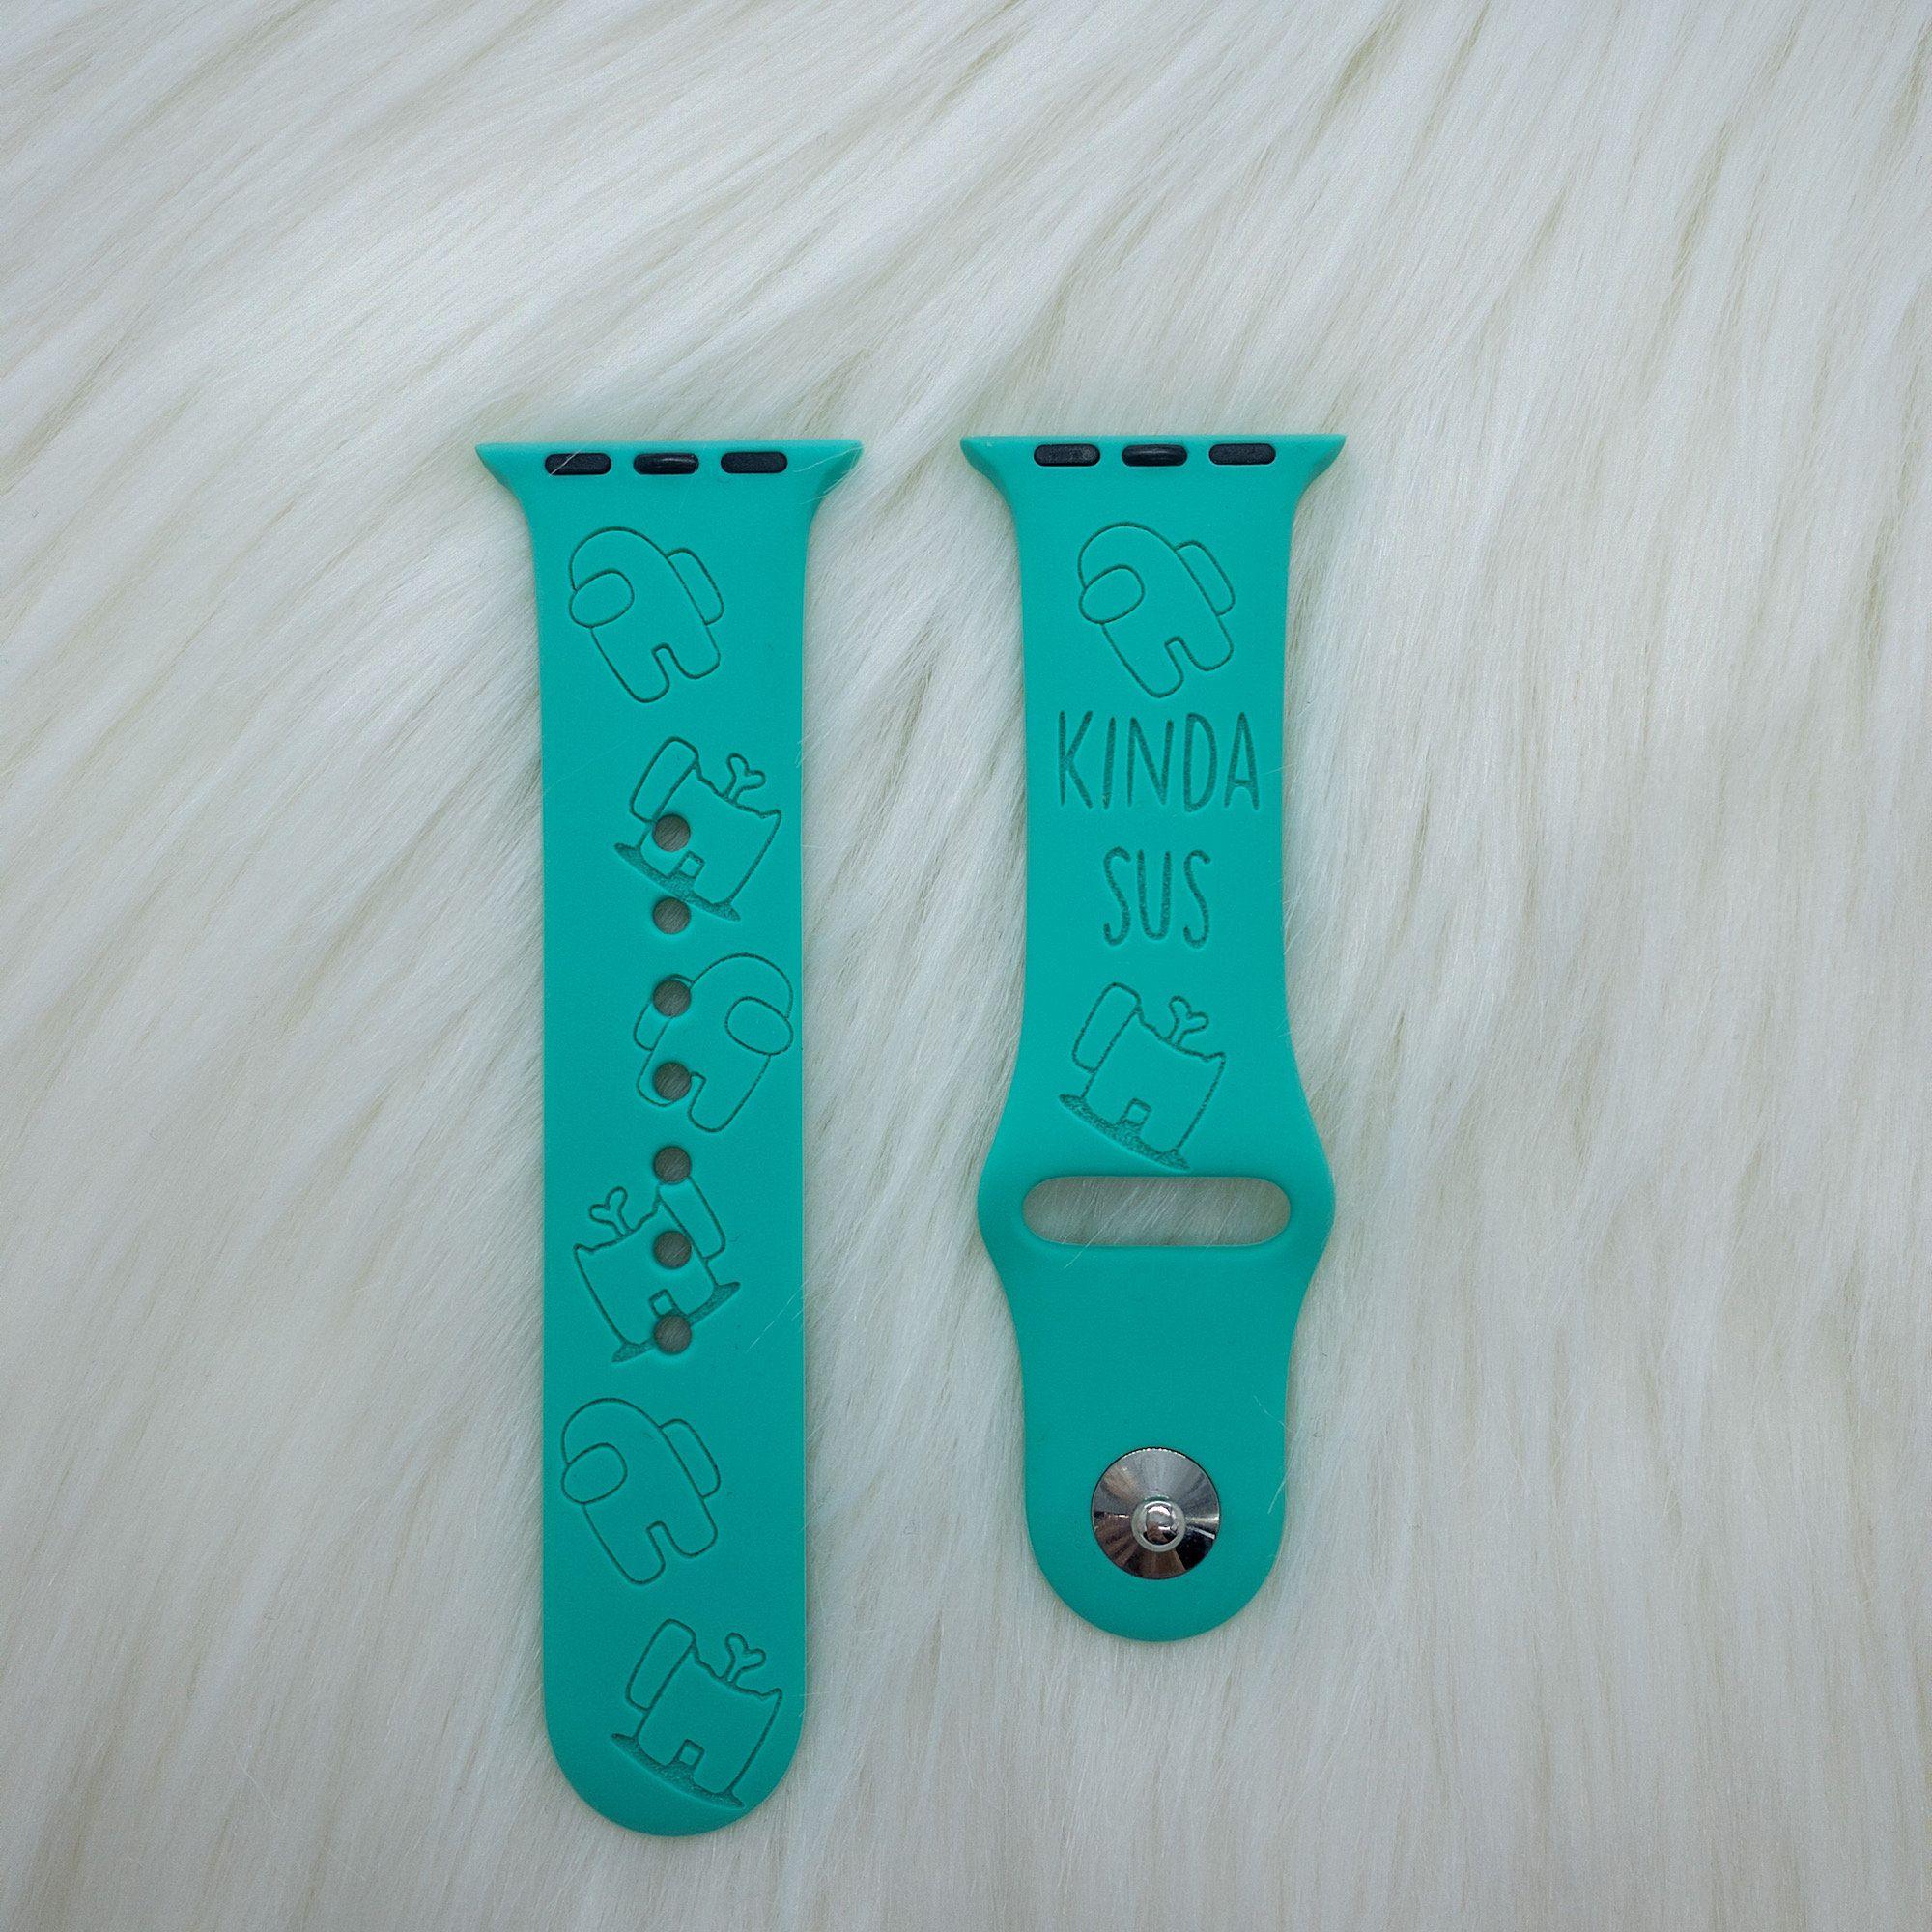 Among Us Crewmate Apple Watch Band Kinda Sus Apple Watch Band Engraved Apple Watch Band Personaliz Custom Apple Watch Bands Watch Bands Apple Watch Bands